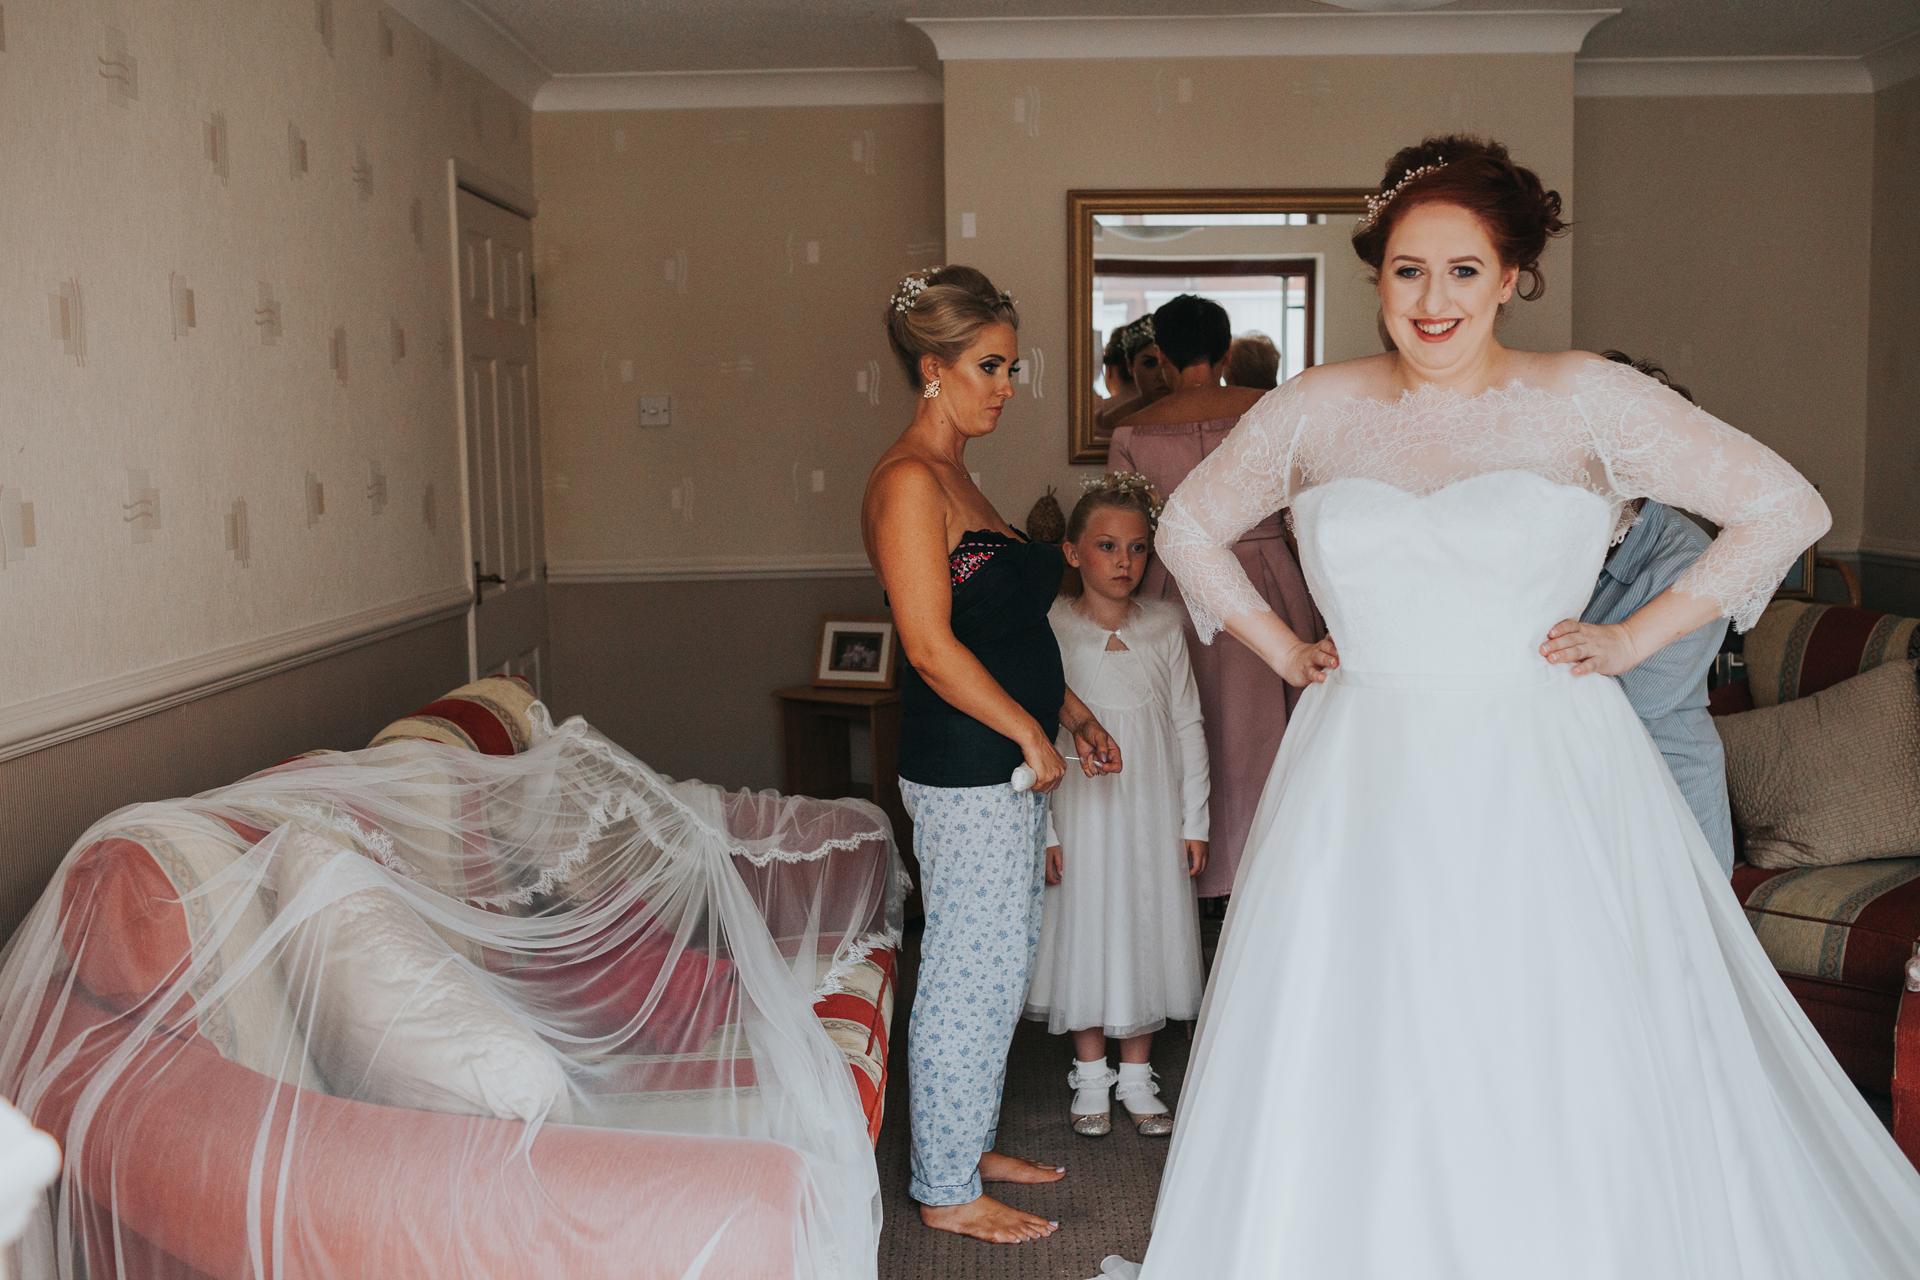 Bride stood next to veil on sofa.